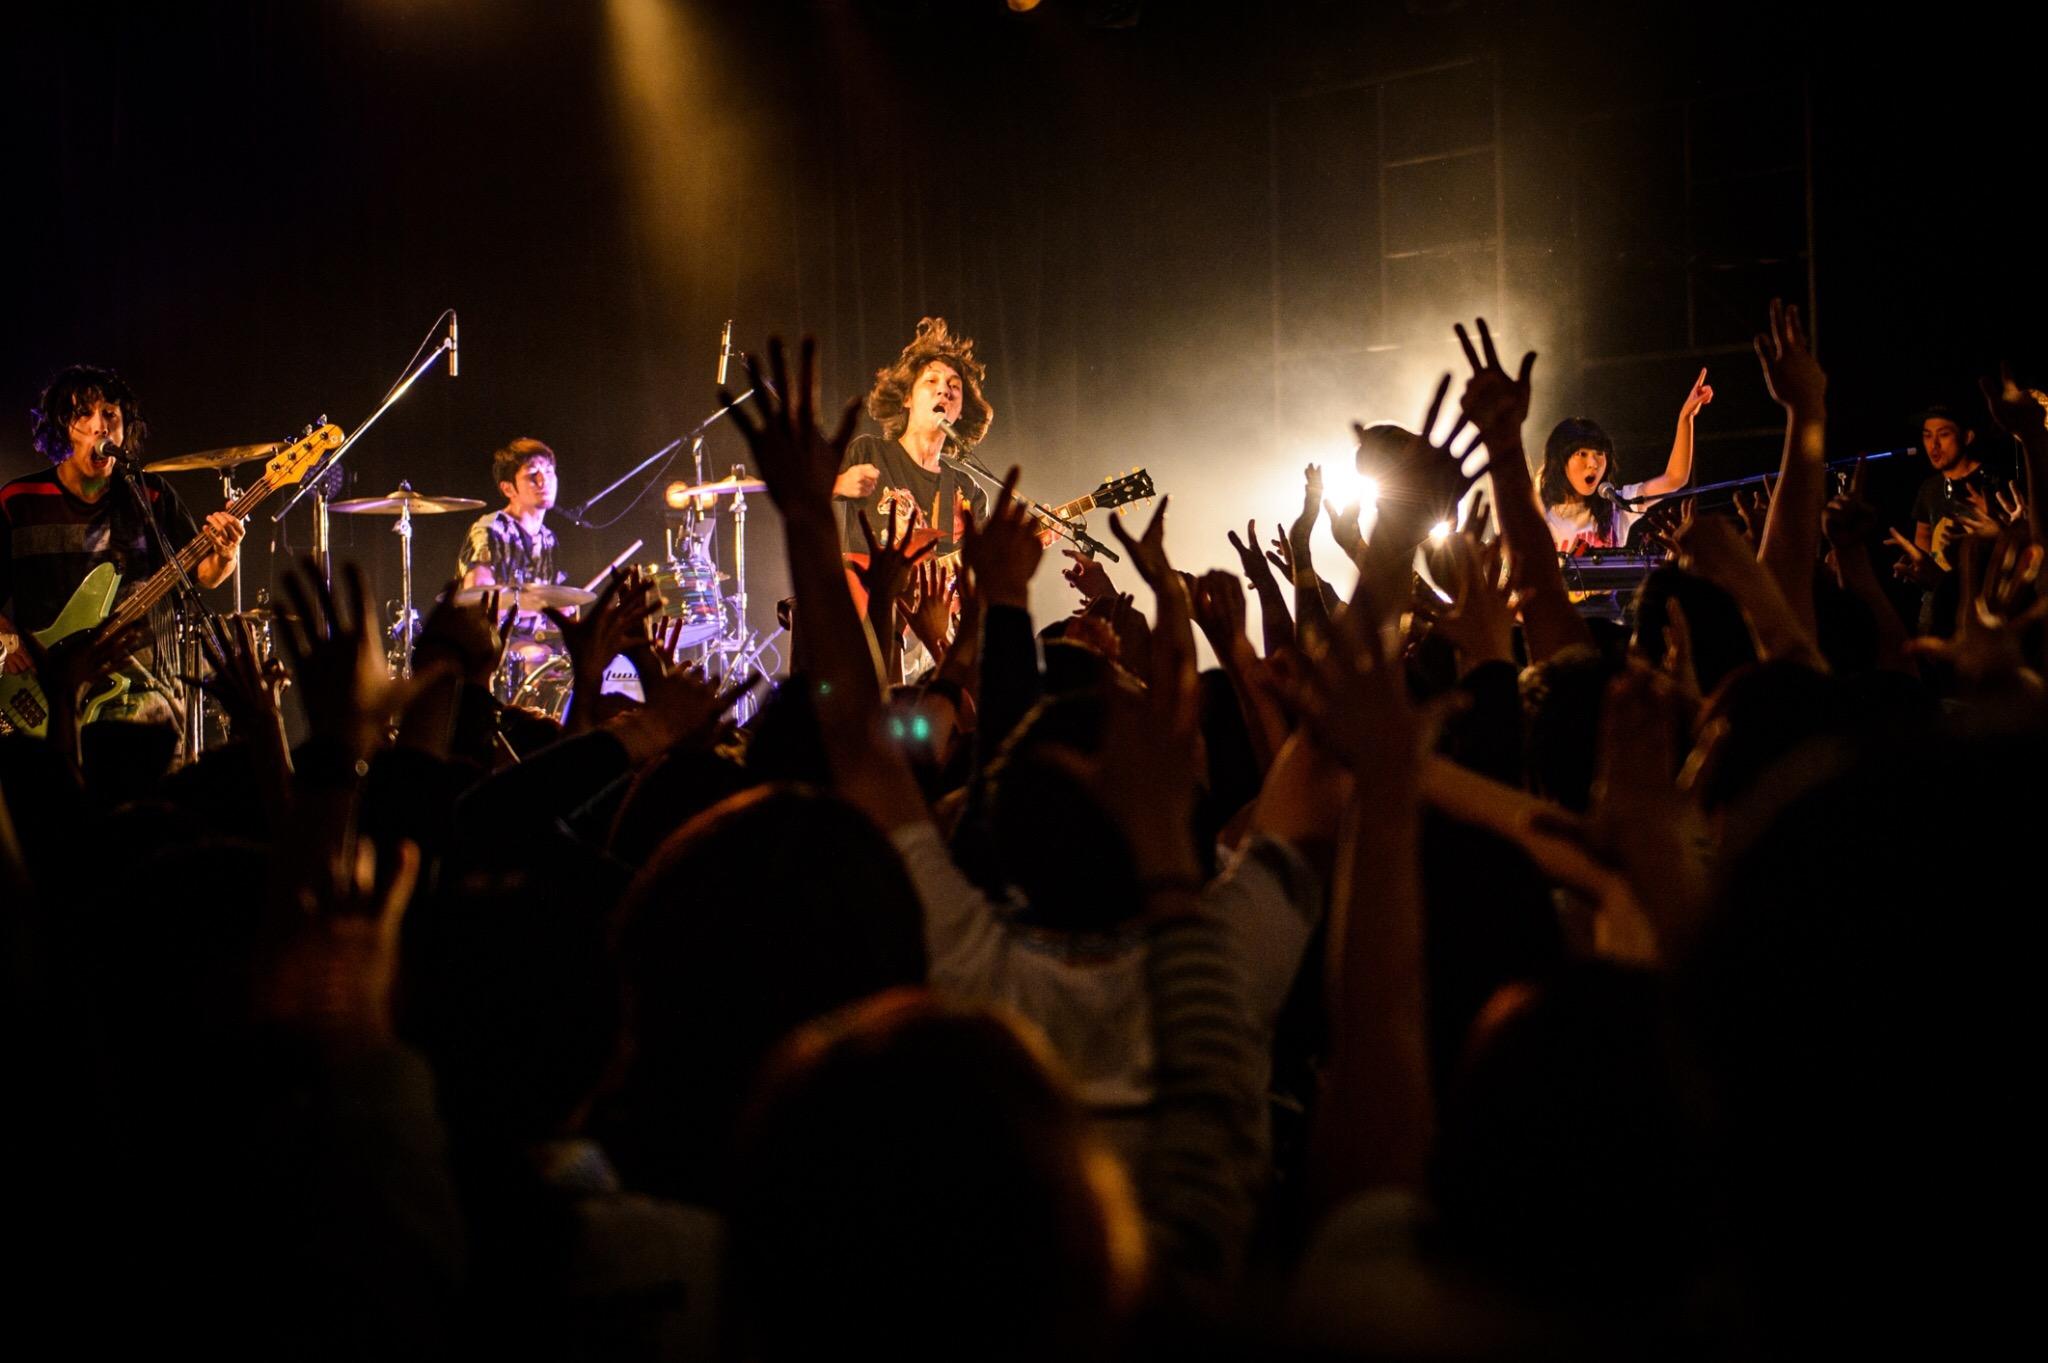 Wienners、ツアー最終公演から「さよなら浦島太郎」のライブ映像即出し